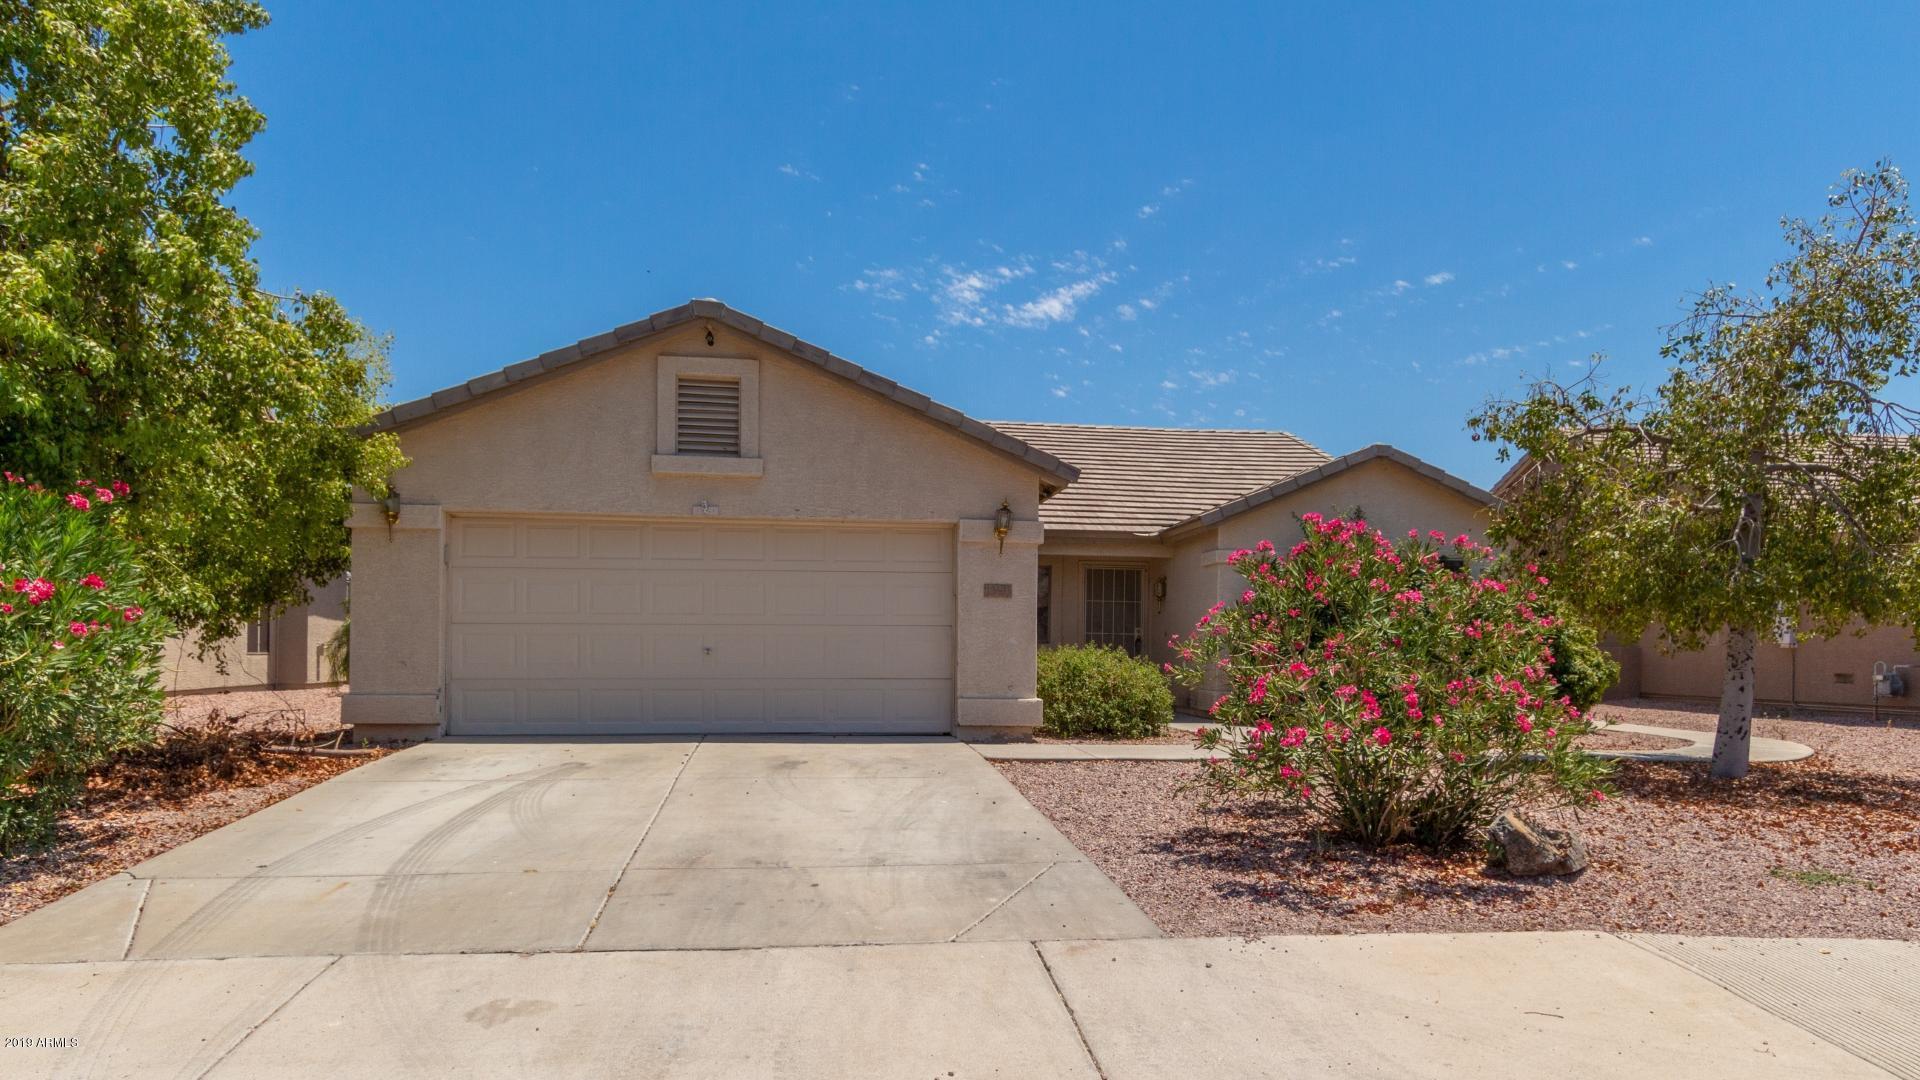 13693 W COTTONWOOD Street, Surprise, Arizona